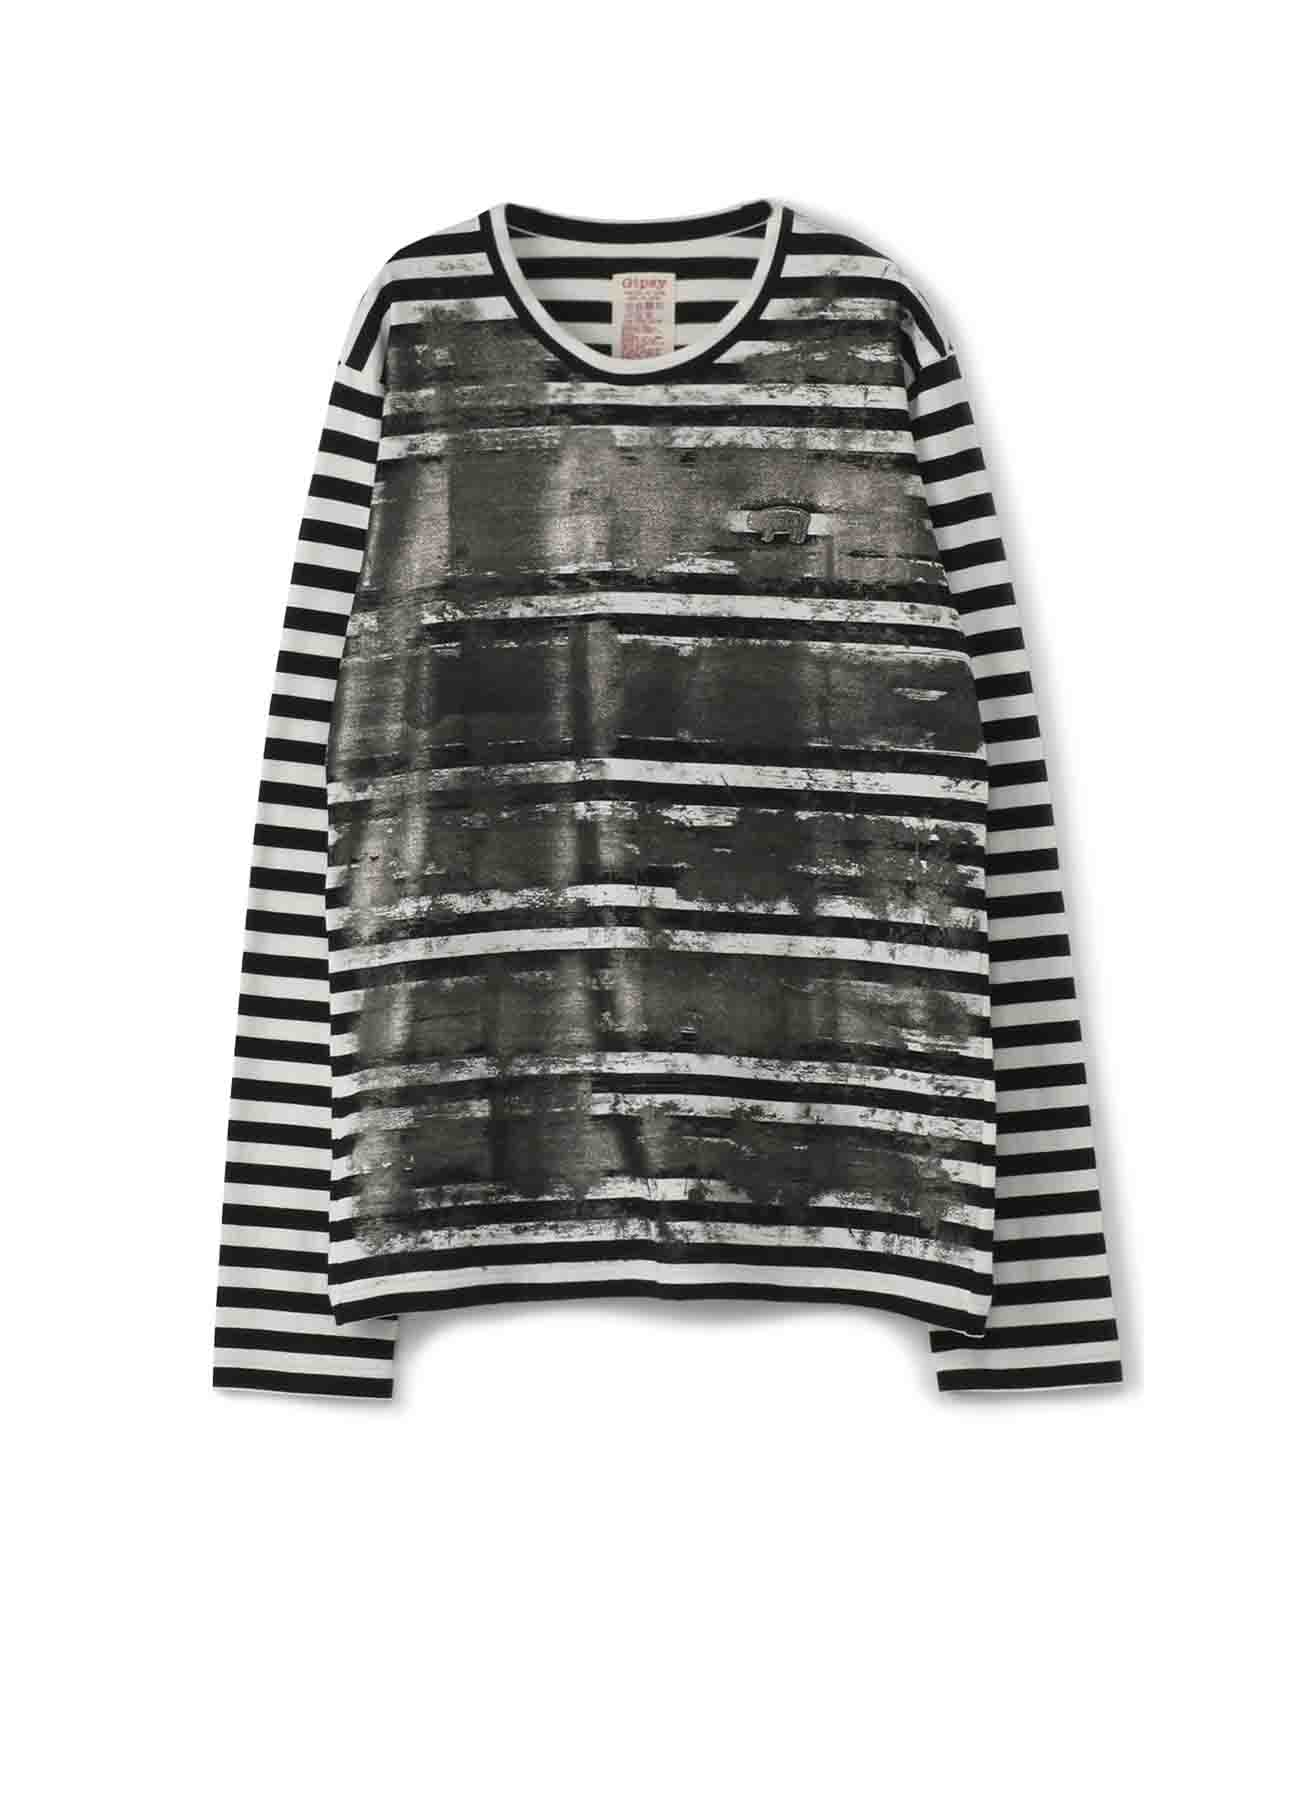 Gipsy边框Tengu BIG长袖T恤